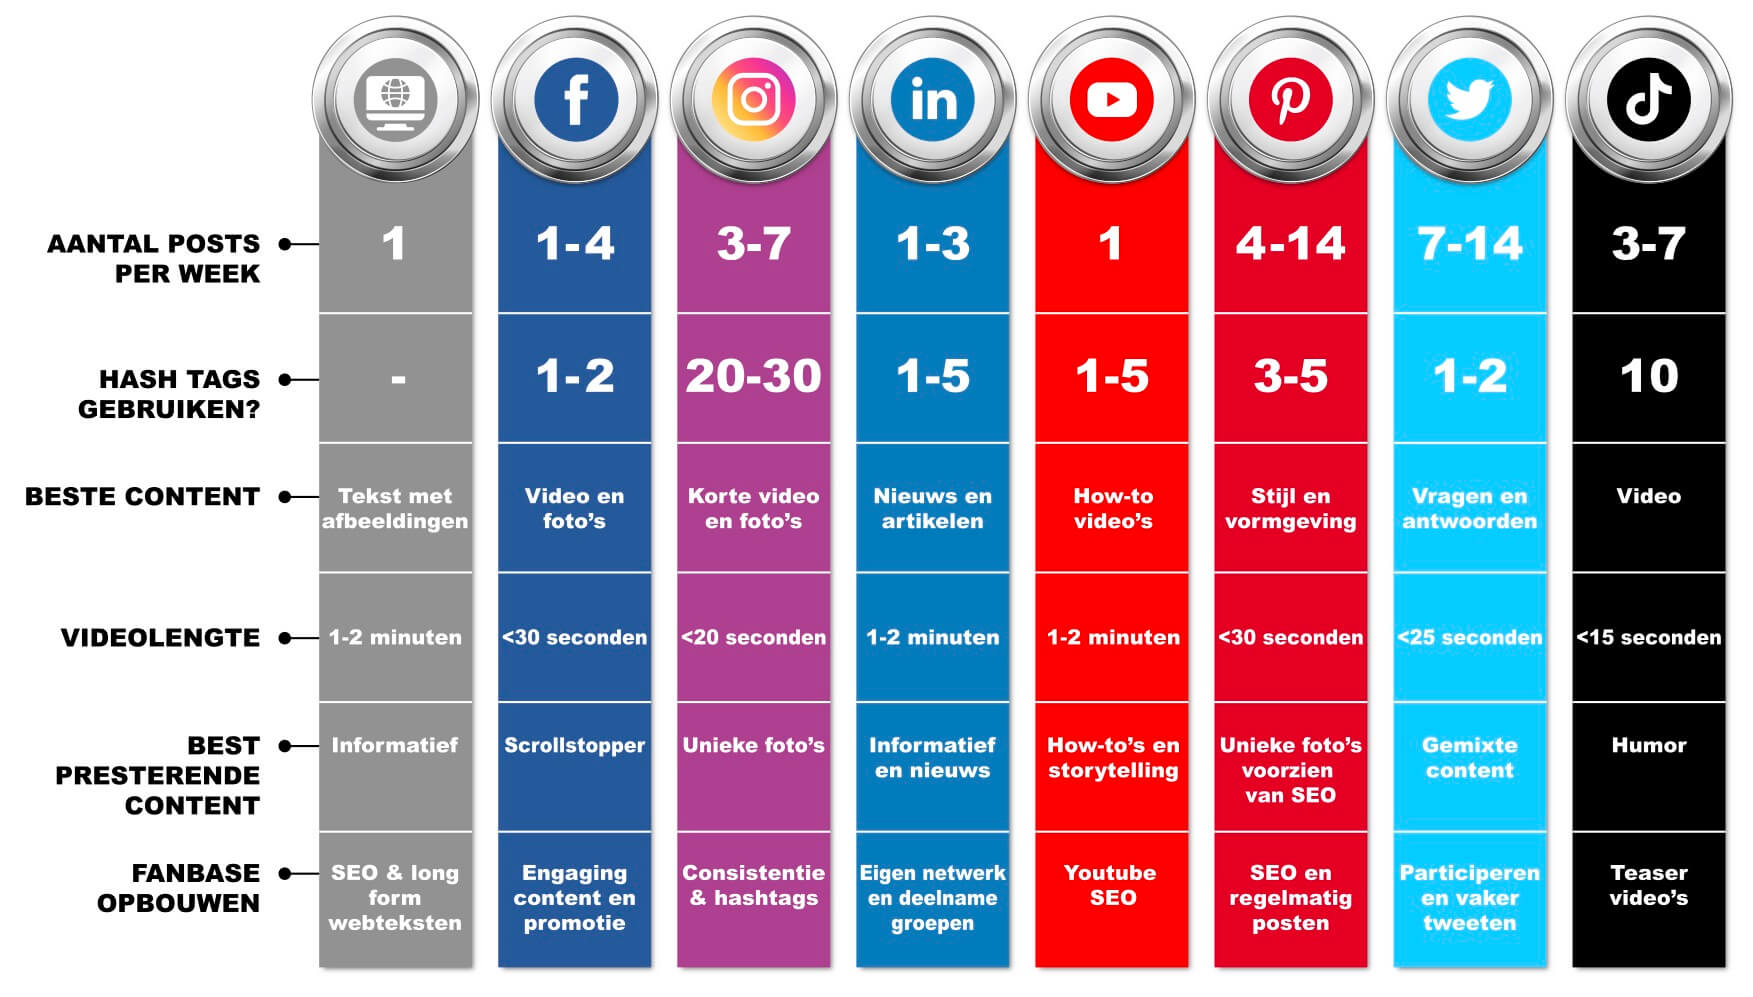 Hoe vaak posten op social media?